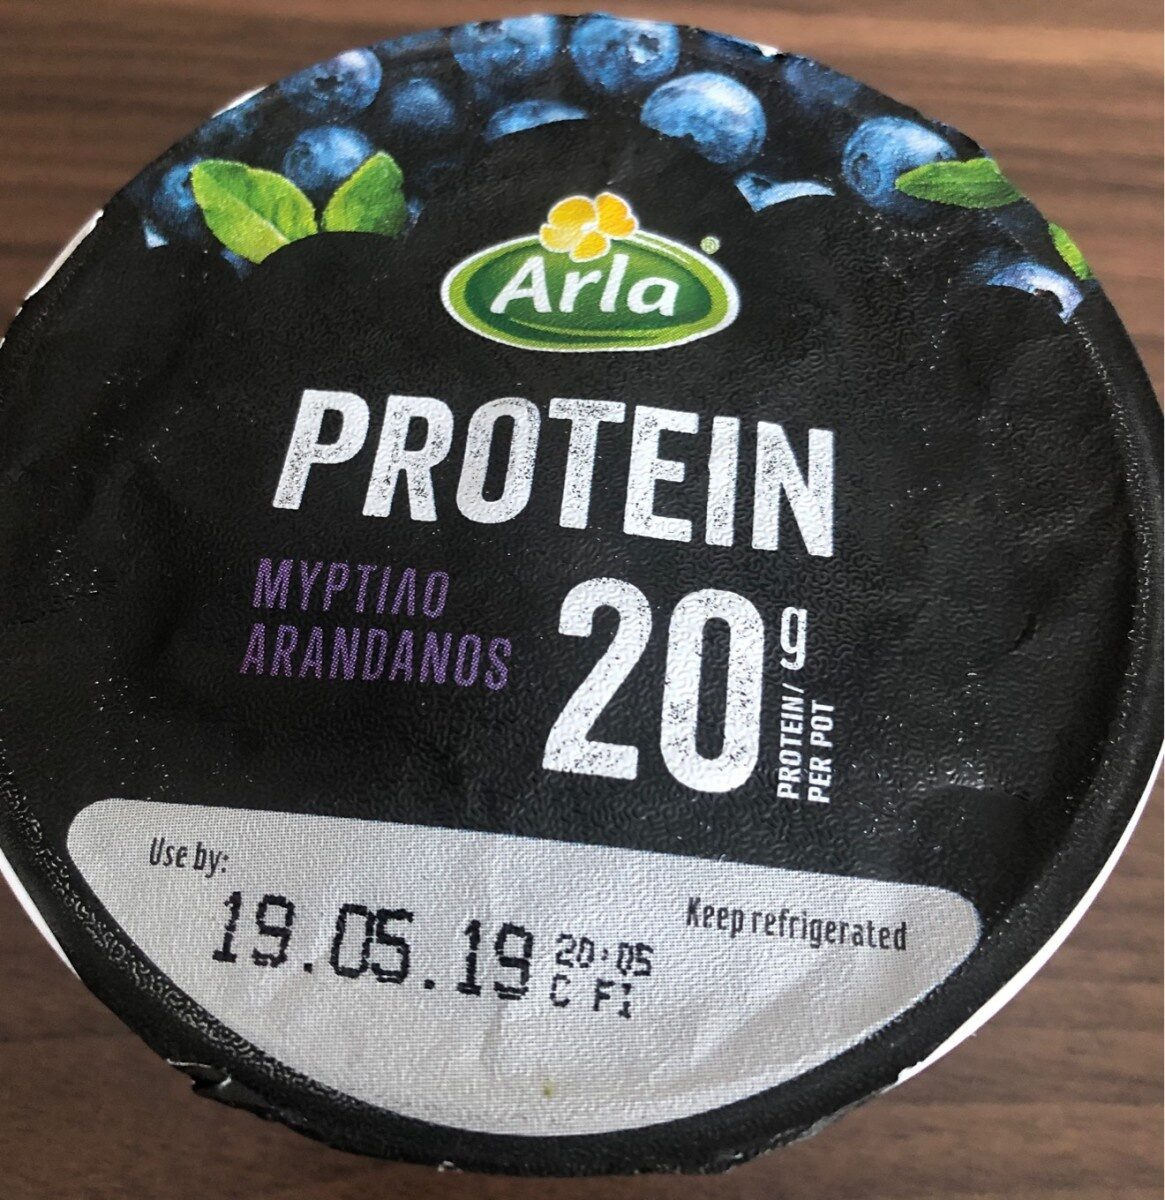 PROTEIN ARANDANOS - Product - fr